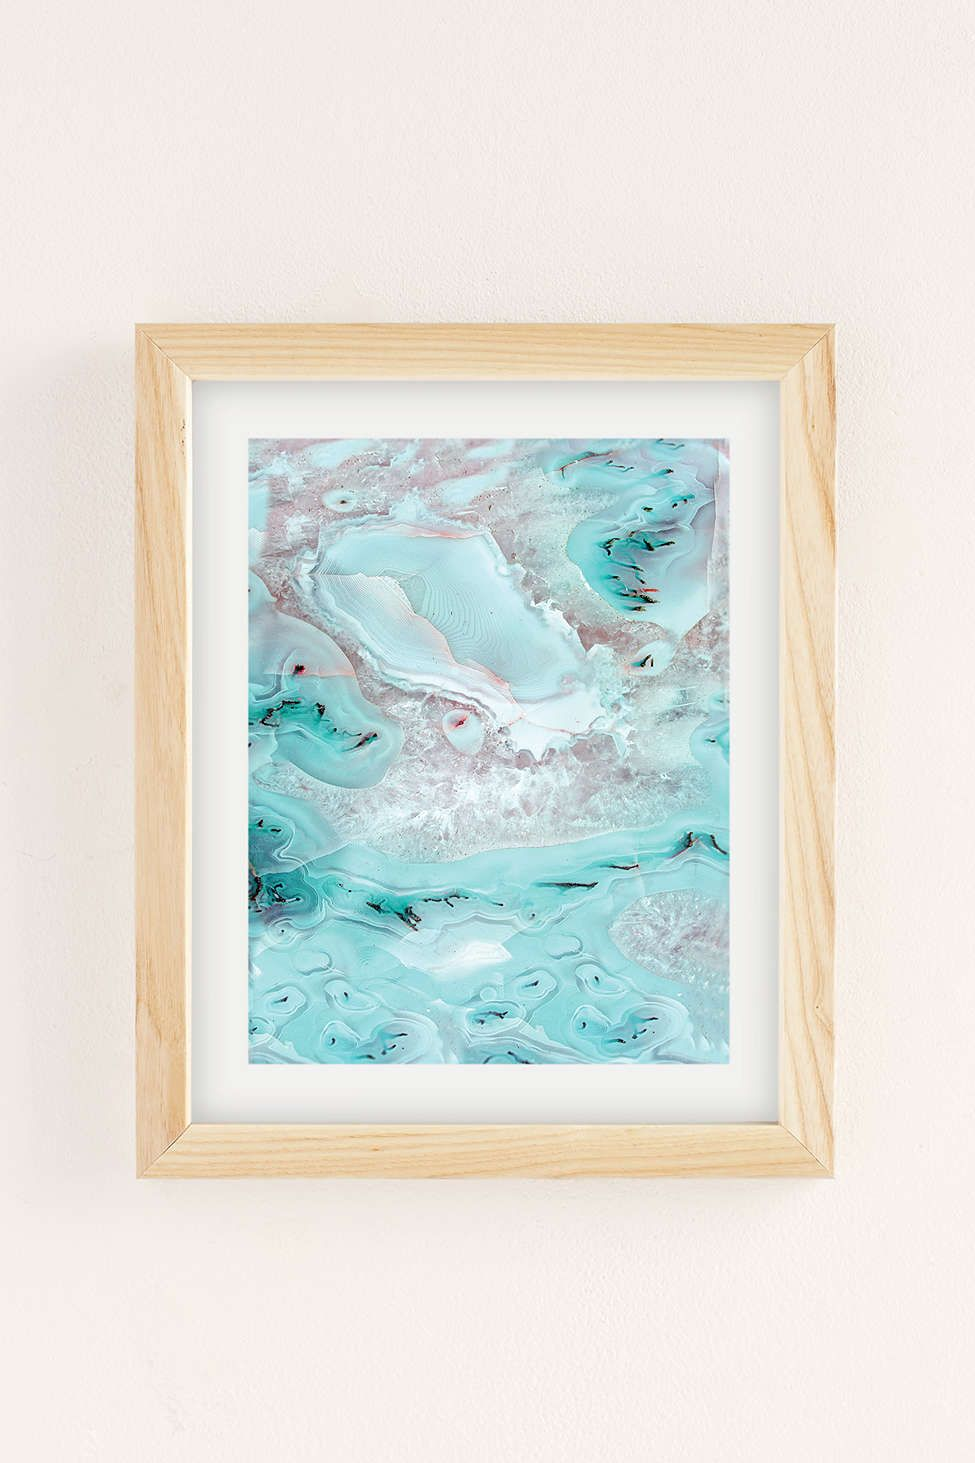 UO Custom Agate Art Print 30x40 $199 framed